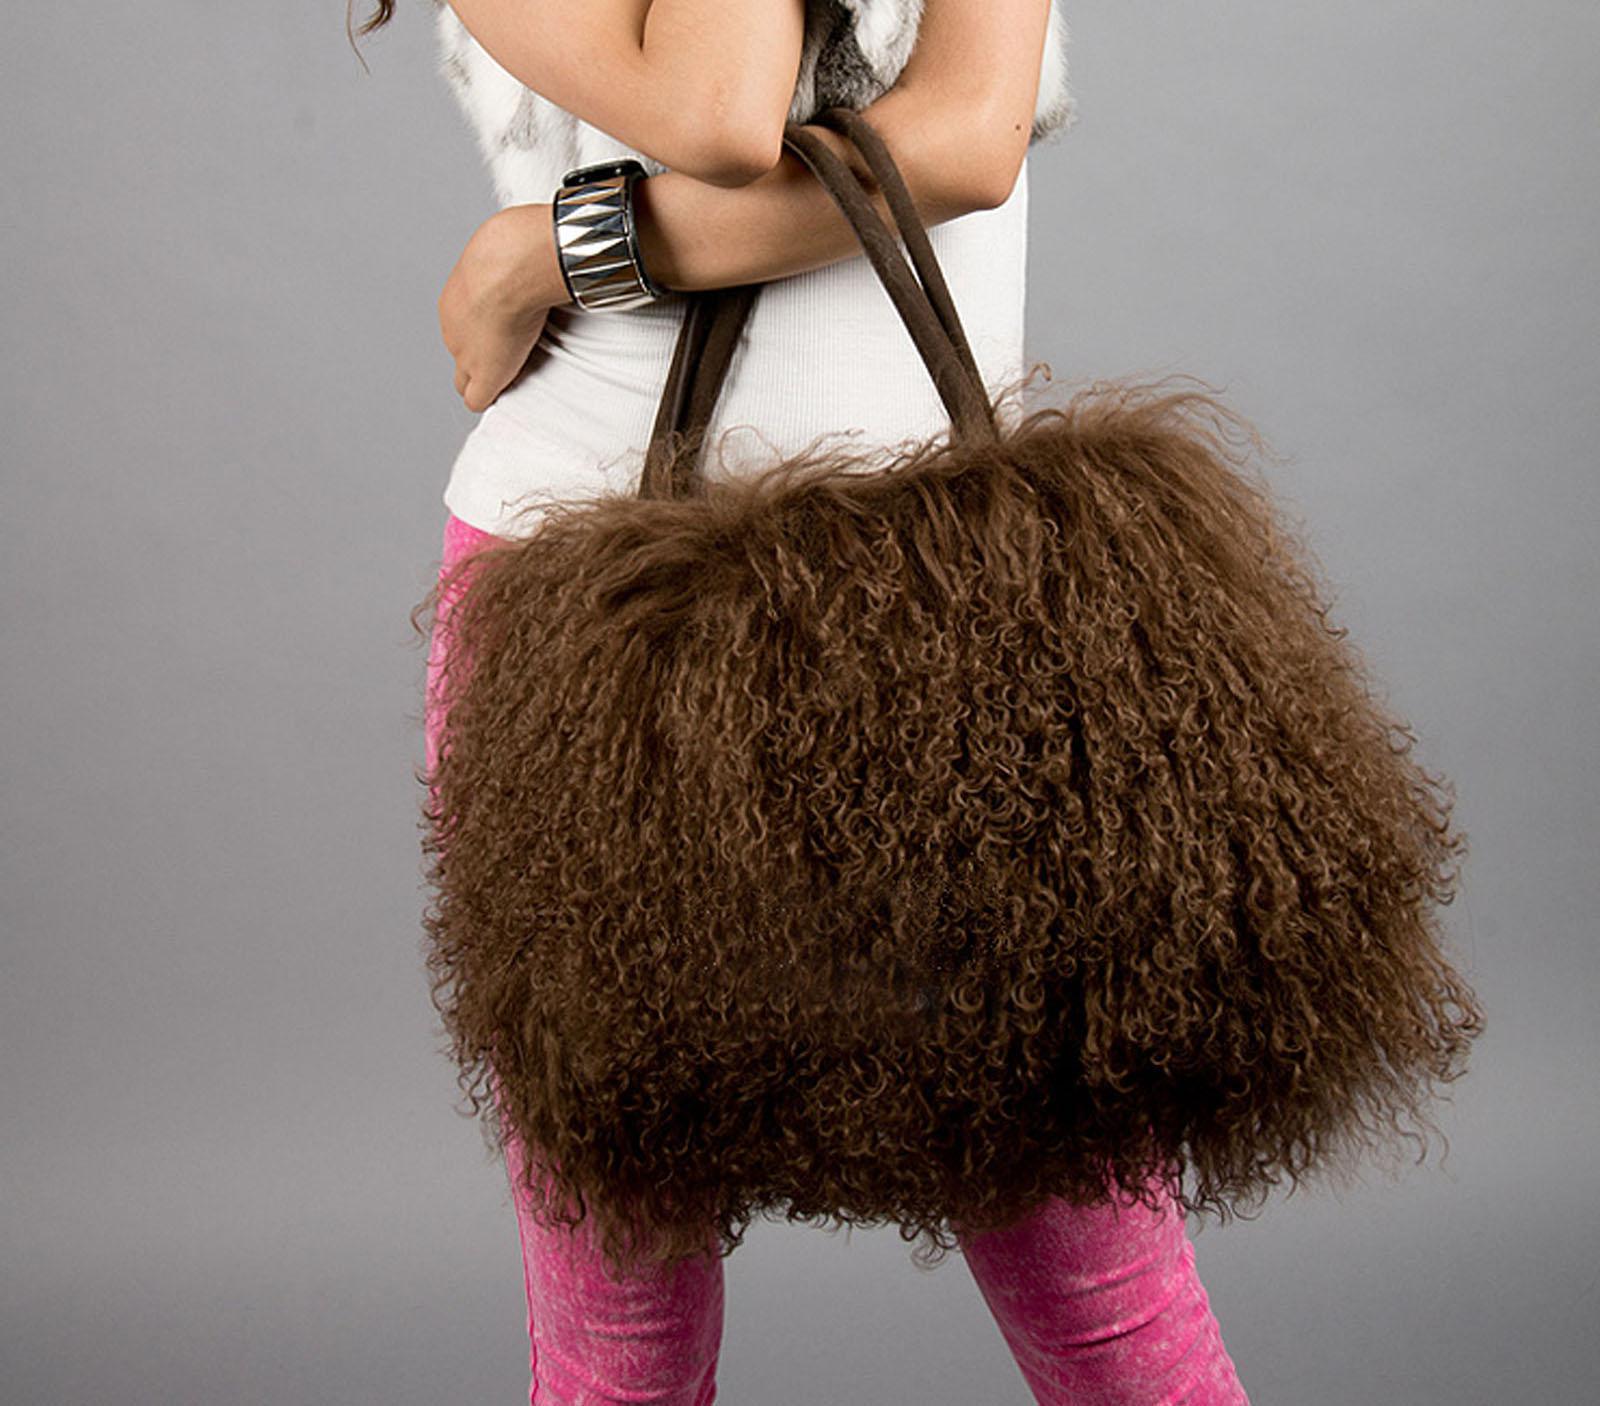 New Large Real Long Lamb Fur Mongolian Fur Bag Handbag On SaleMulti Colors  Hobo Purses Leather Bags For Women From Nicole200612 94e0aa289d8ef